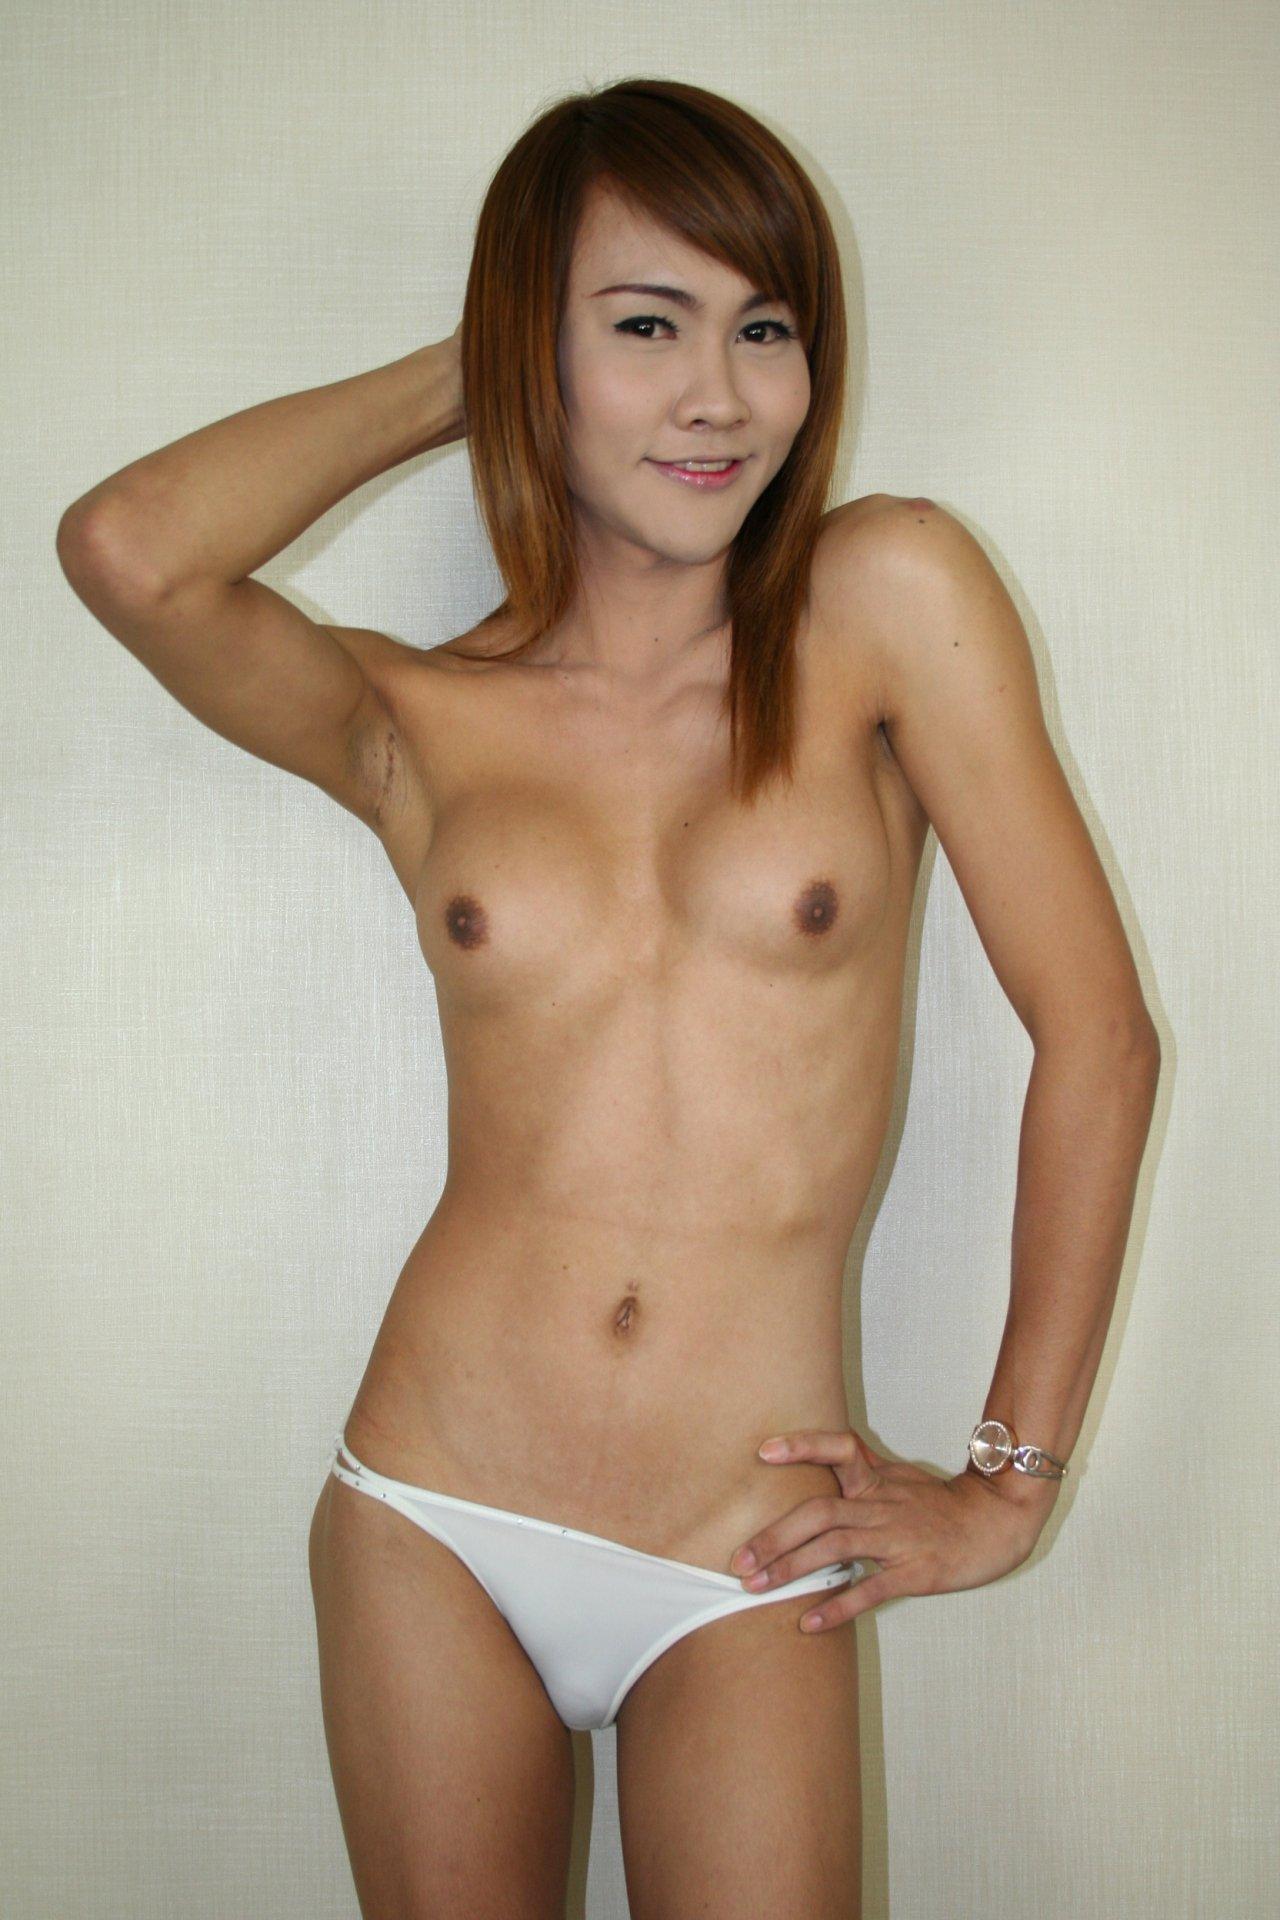 SexyGodess from Western Australia,Australia